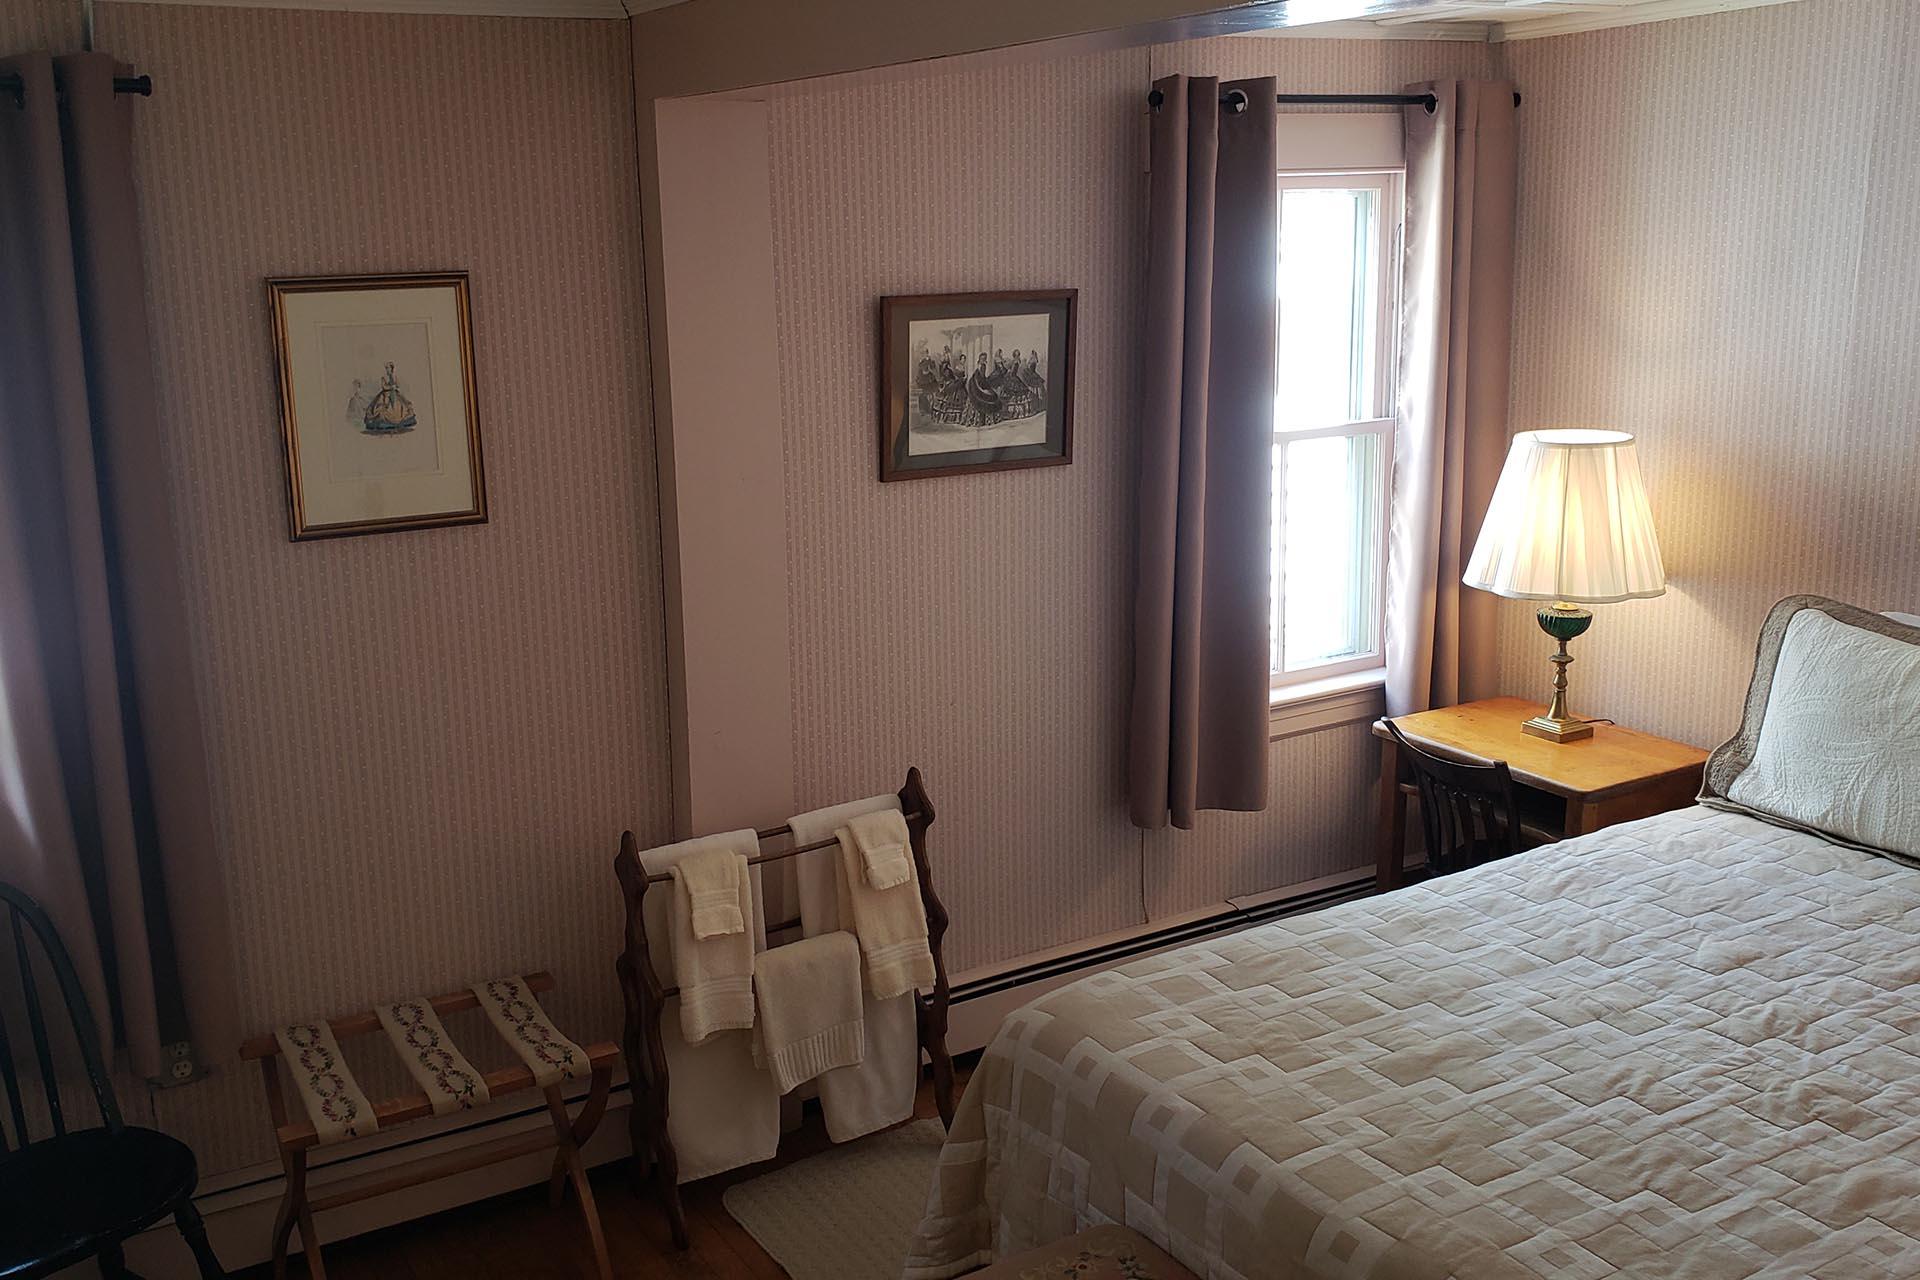 Hawks Inn Bedroom 4